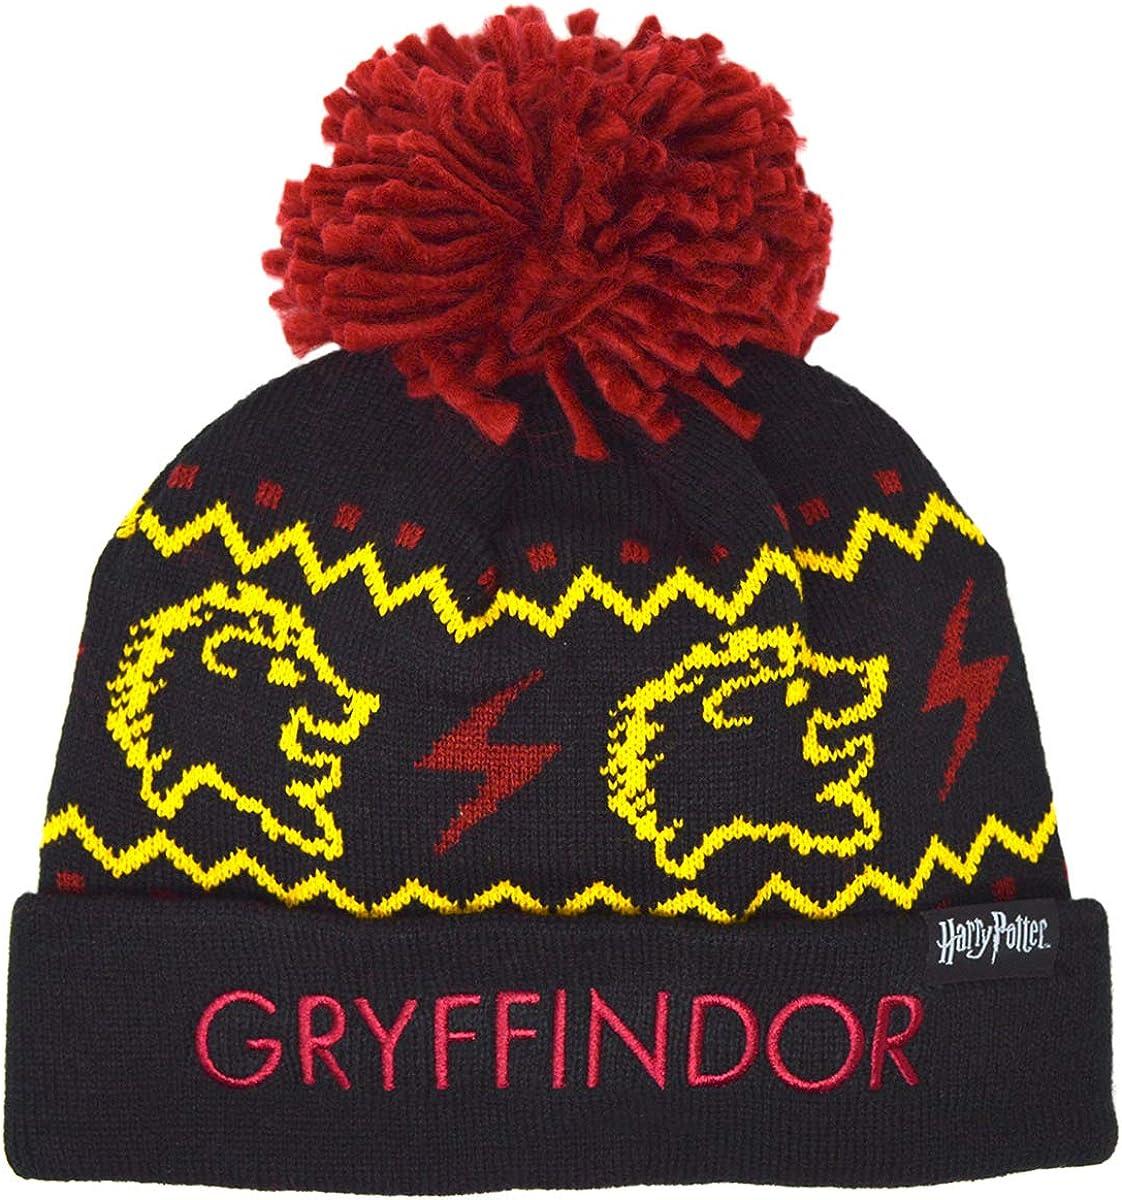 Kids Harry Potter Hogwarts Gryffindor Beanie Hat 8-14 Years Black//Red//Gold